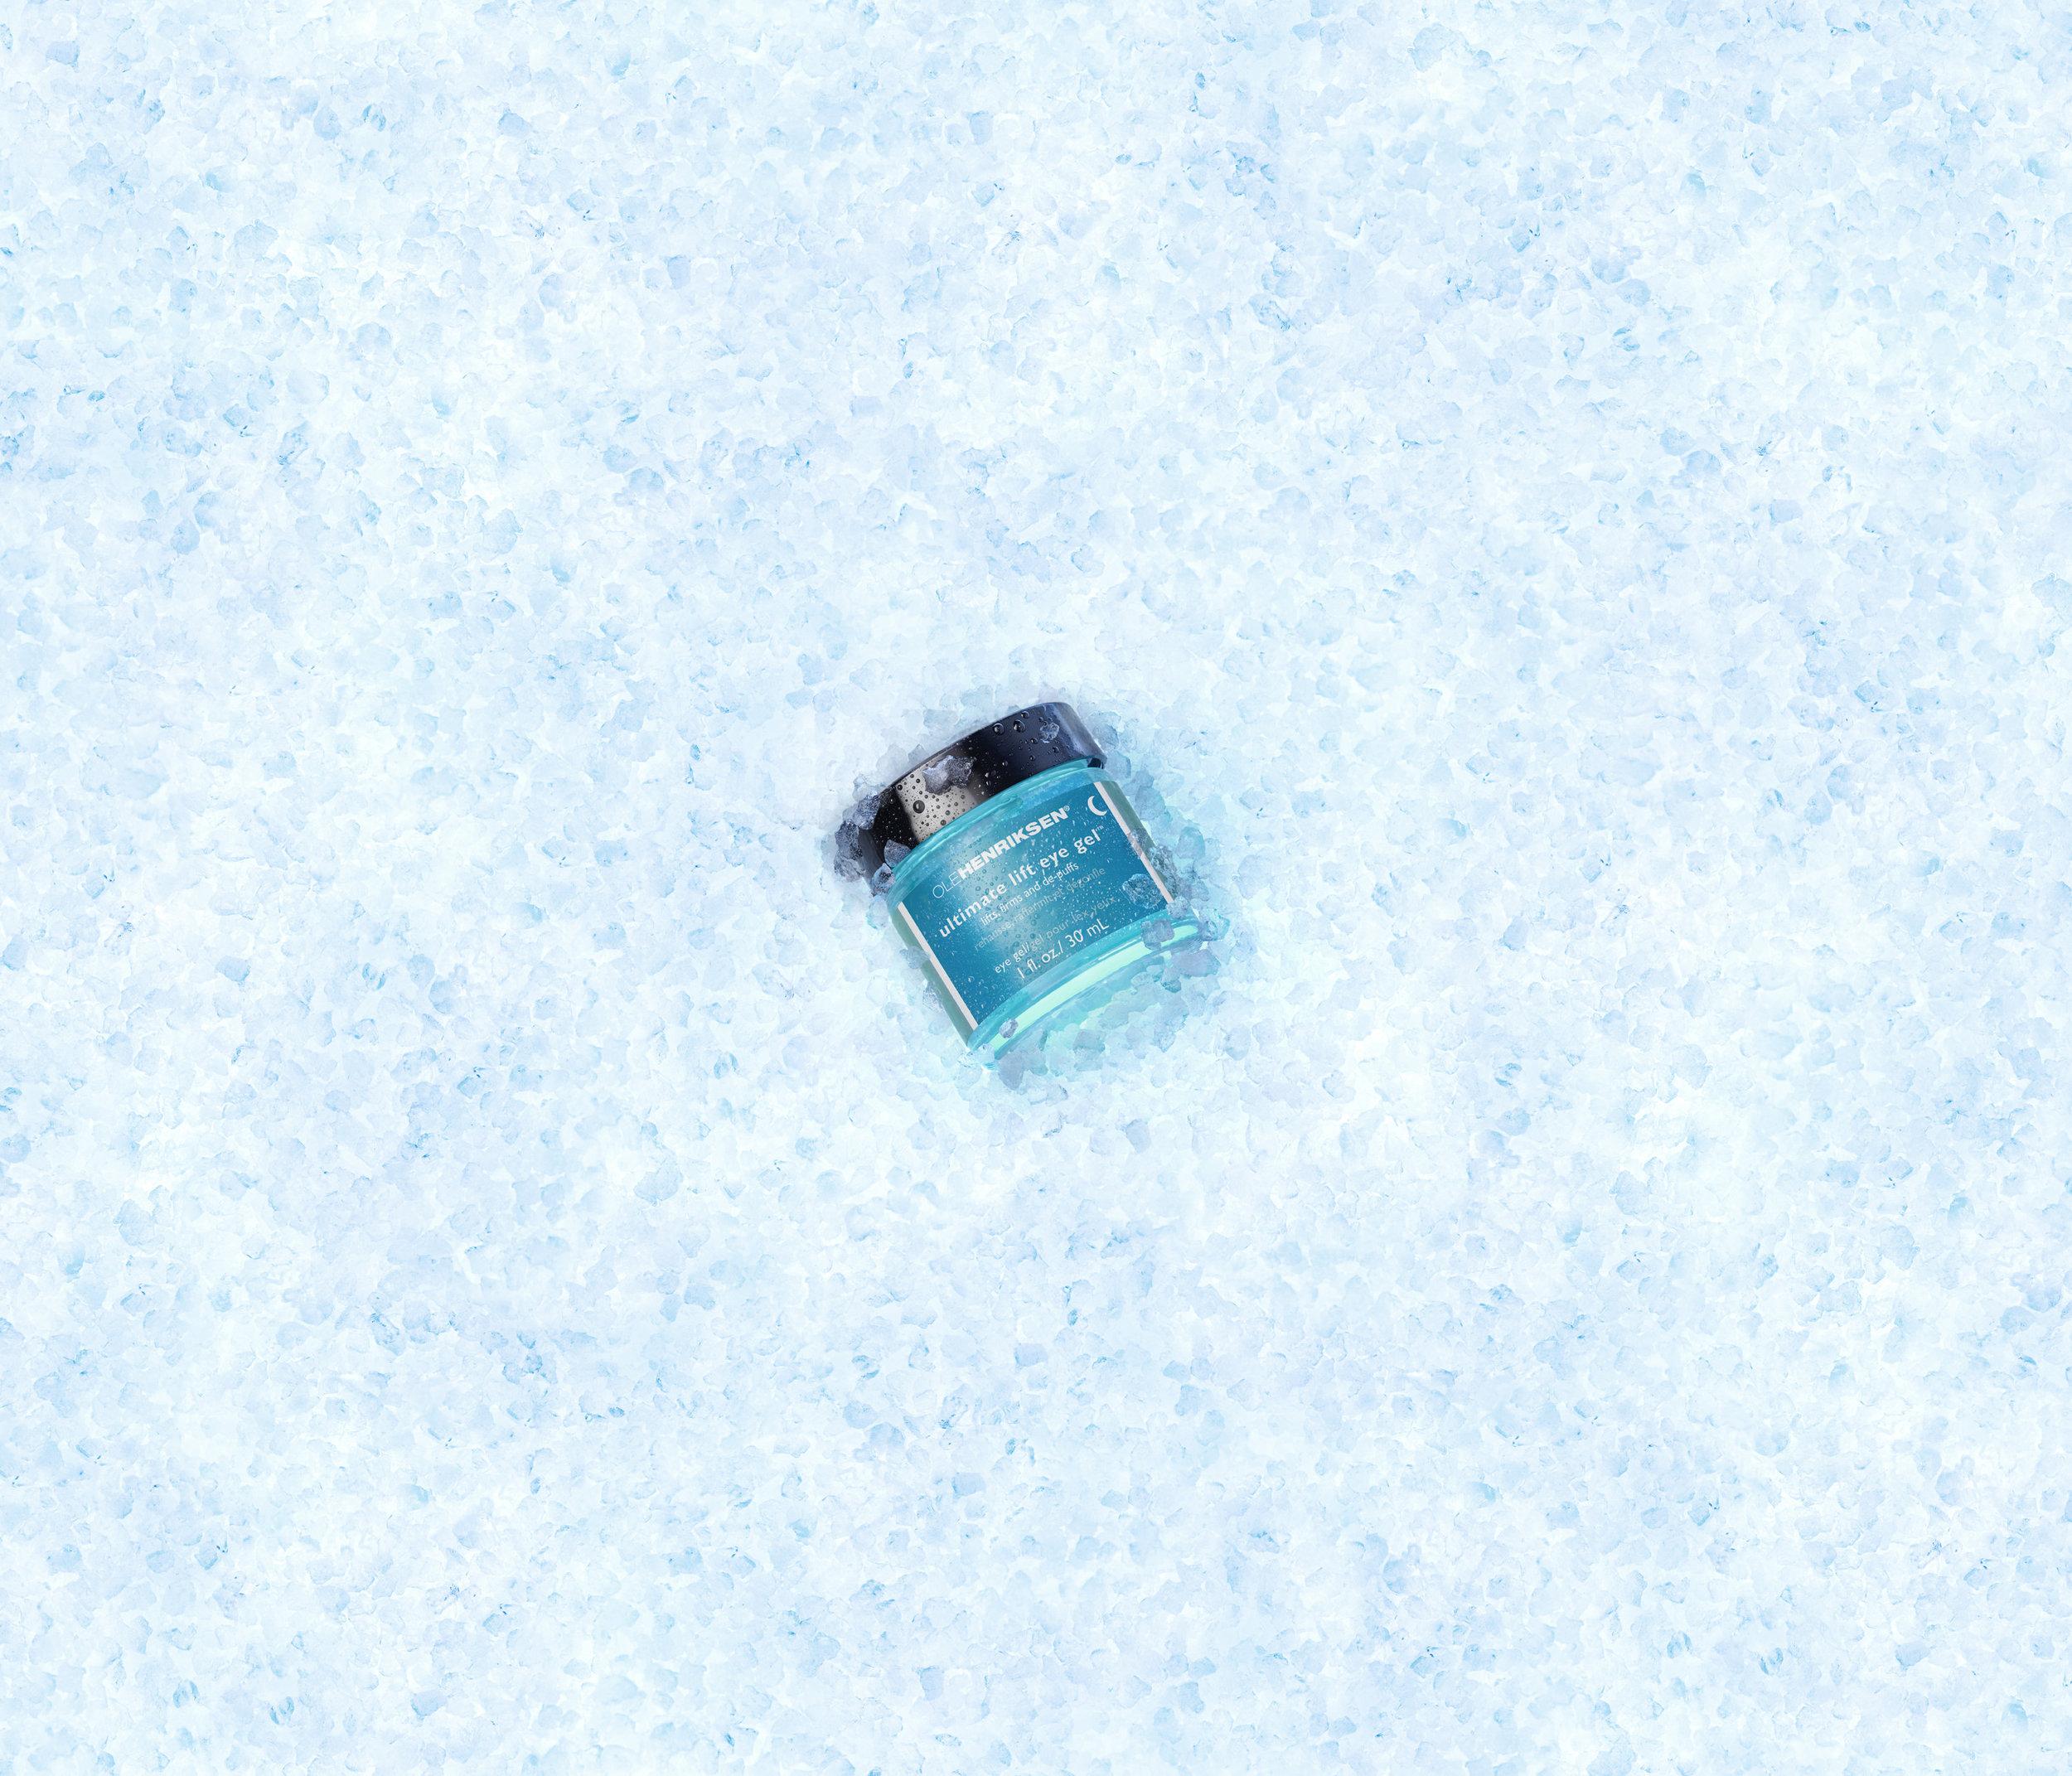 OH_Shot 13_ICE_COMP_RGB.jpg